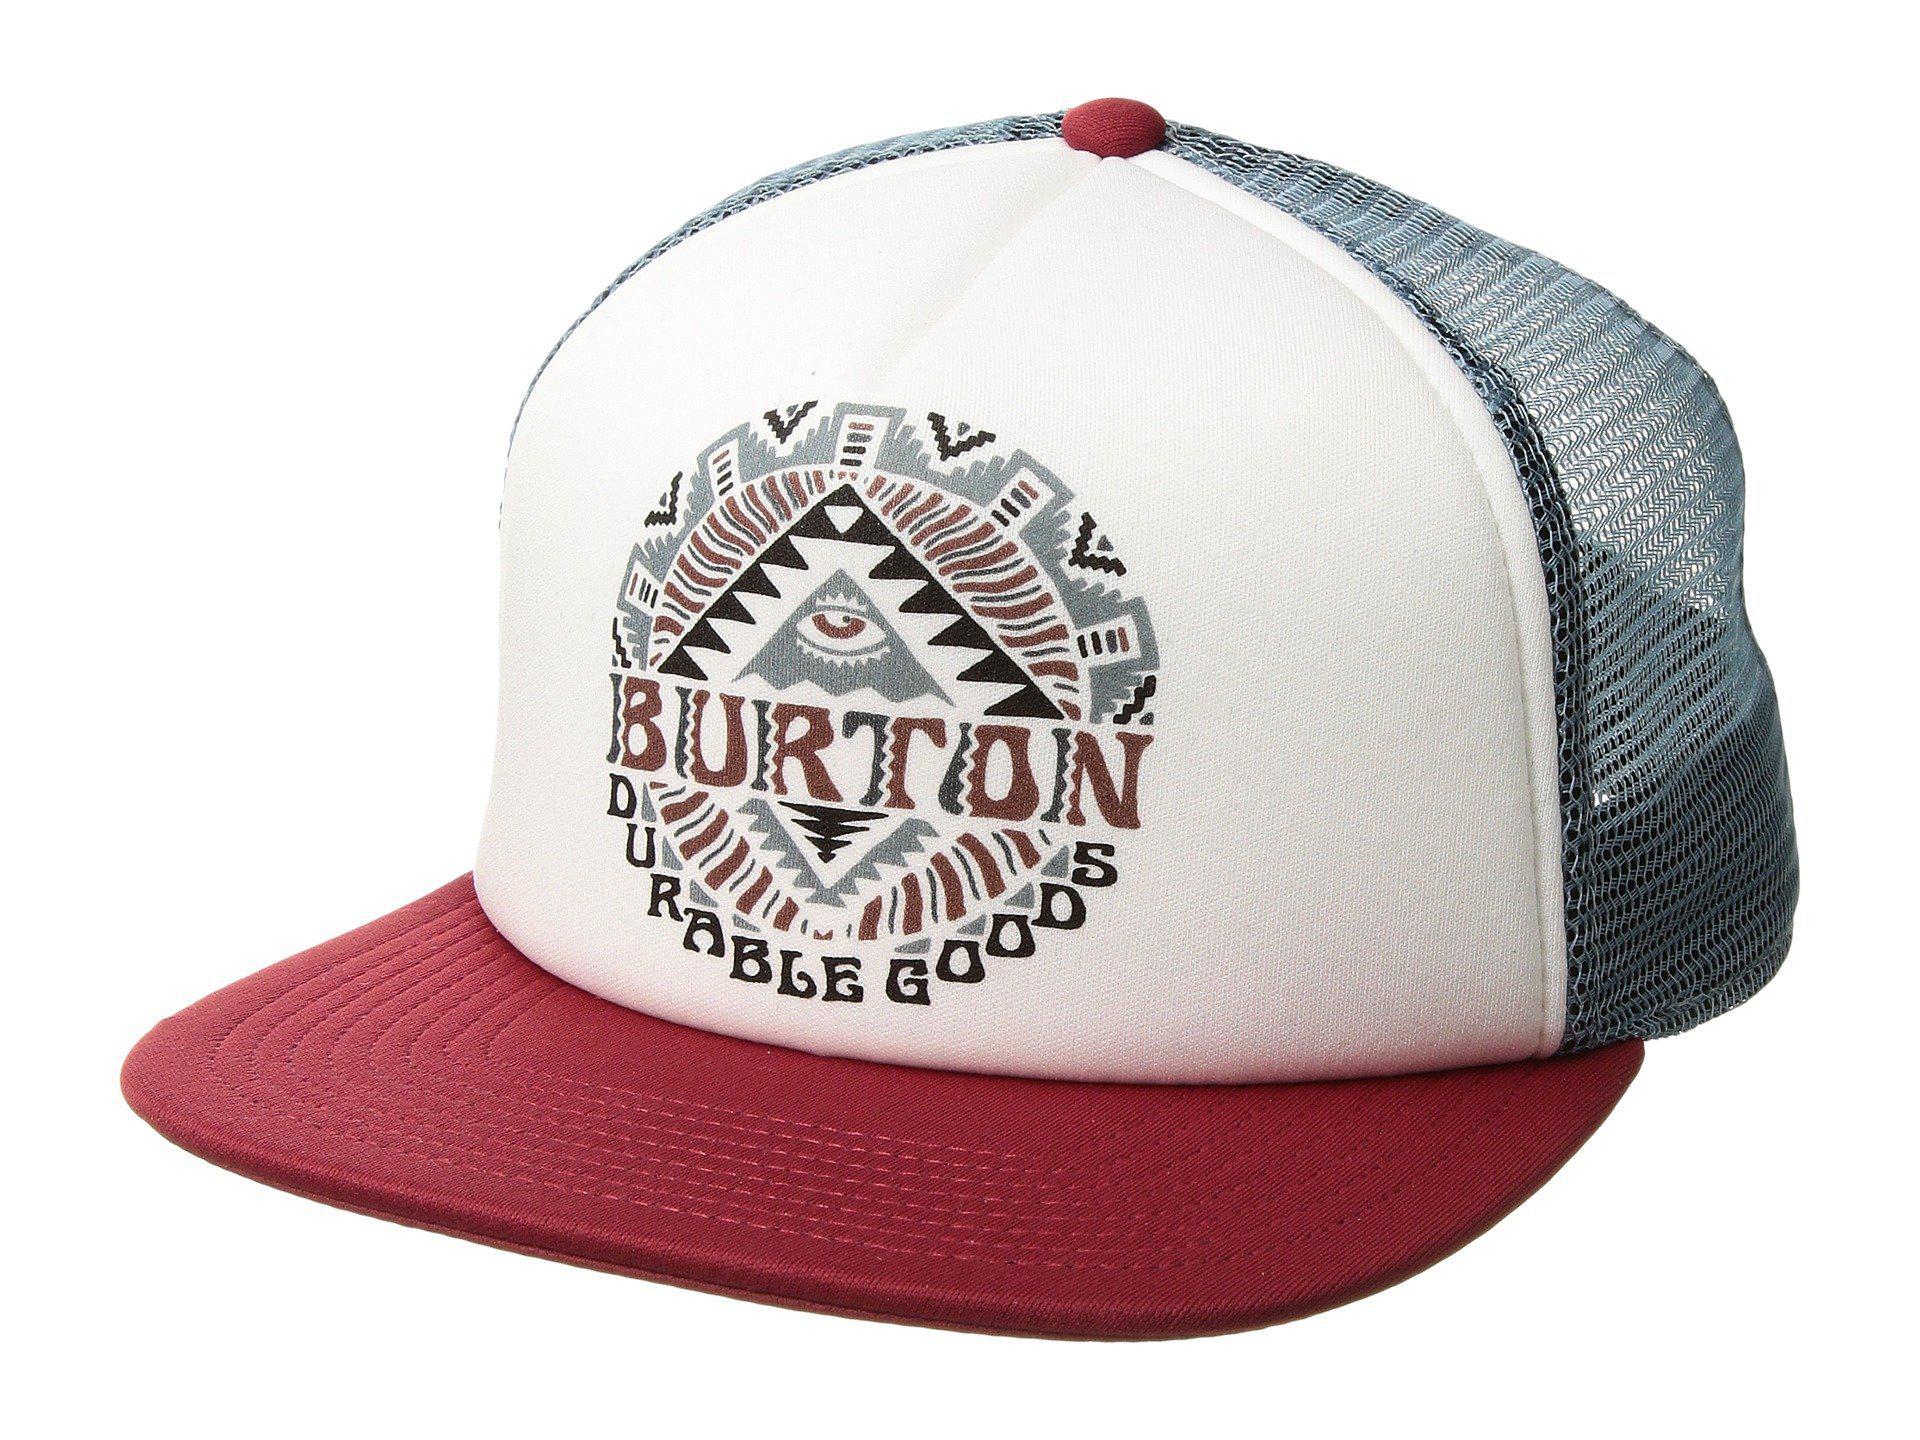 dabb53433842a Lyst - Burton I-80 Trucker Hat for Men